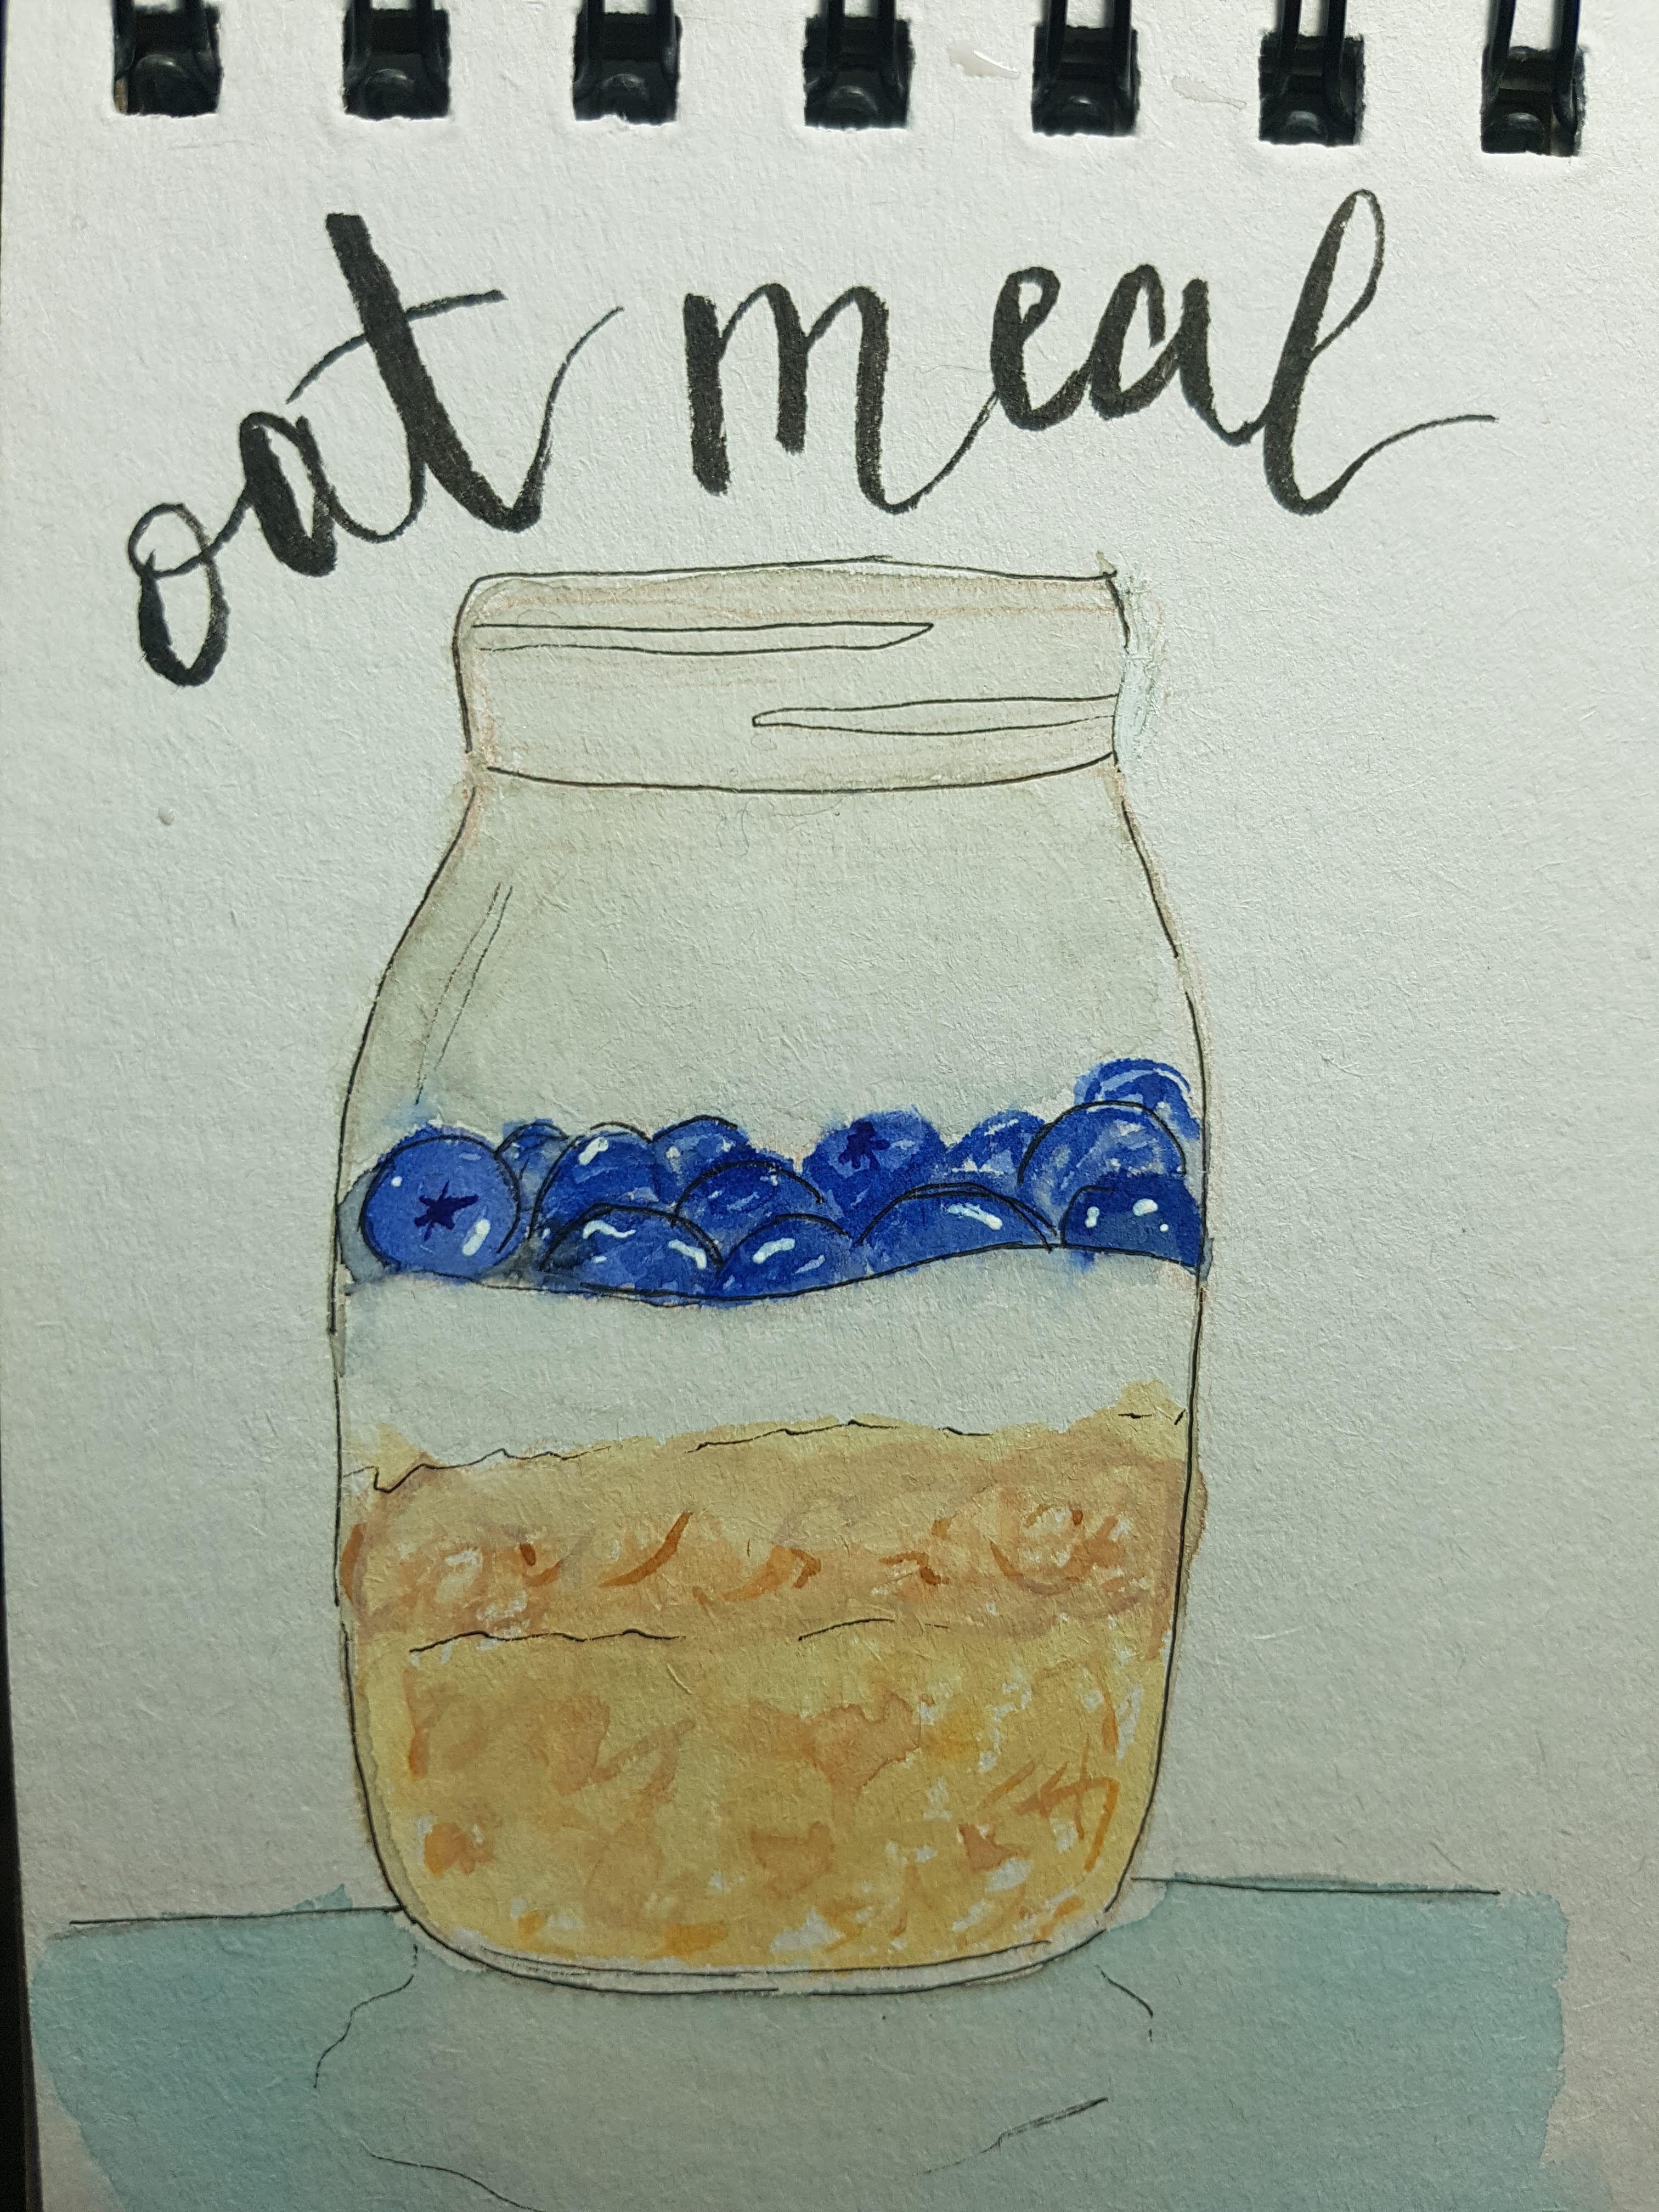 Watercolor Oat Meal Jar Food Illustration رسم طعام حر بالألوان المائية Sketch Book Food Illustrations Art